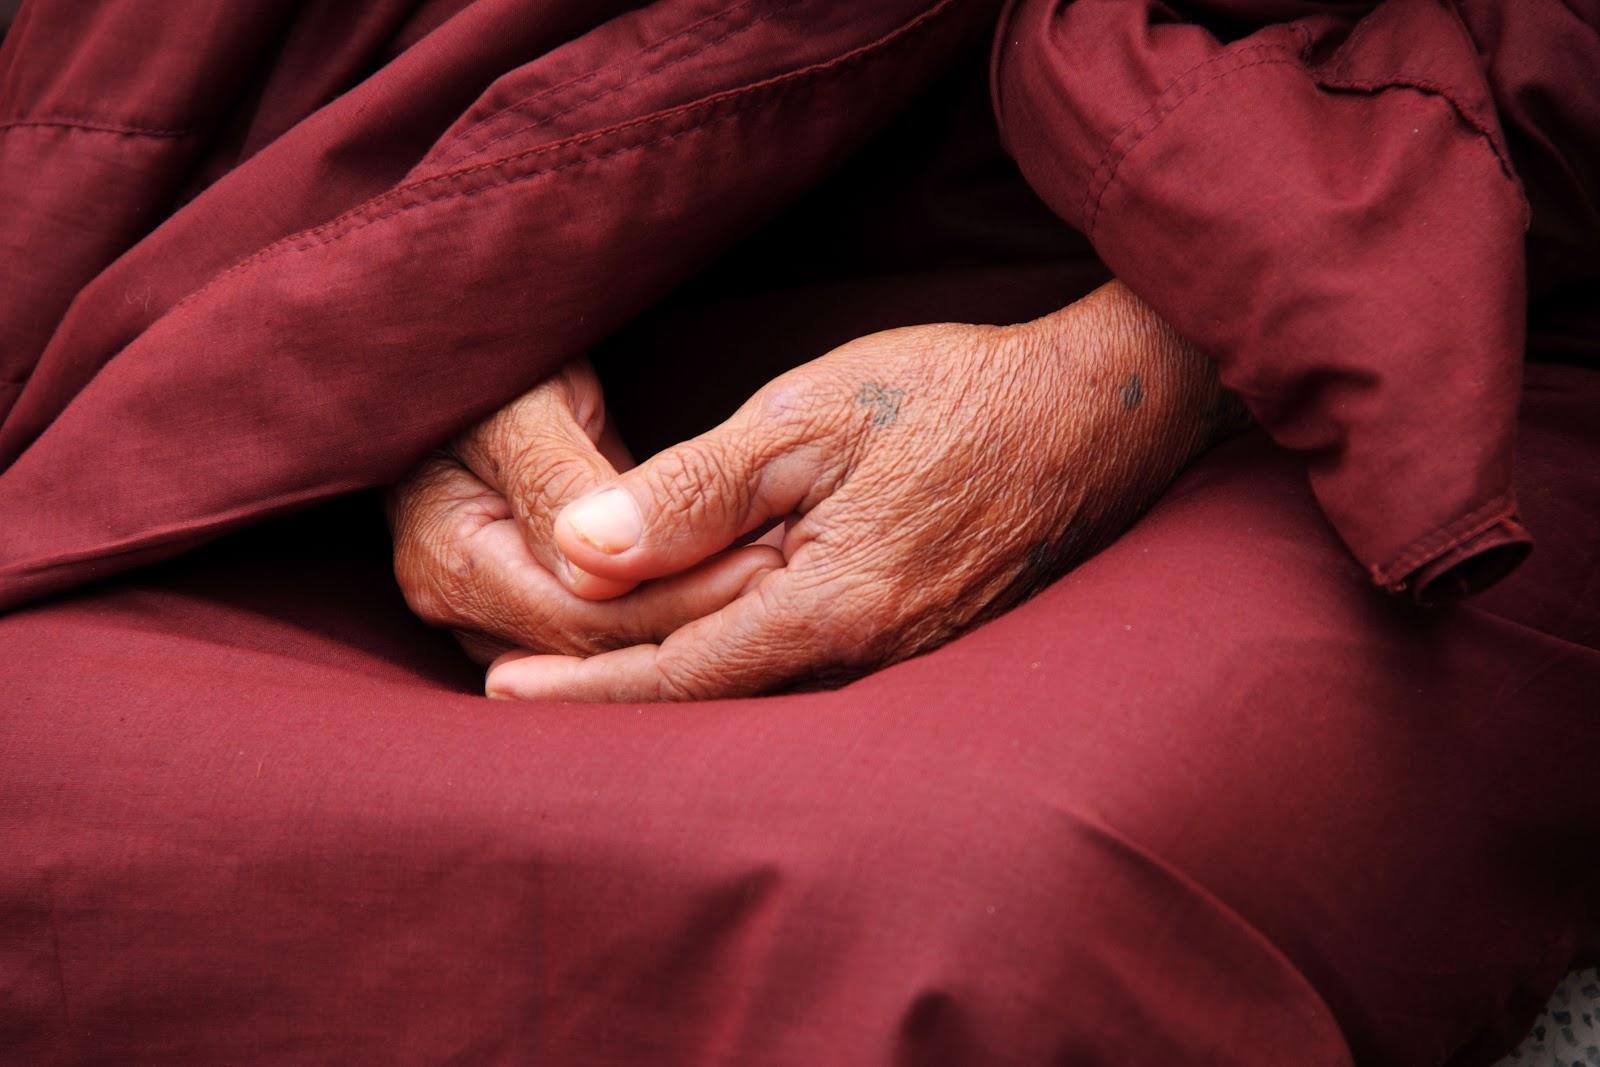 Close up of hands during meditation